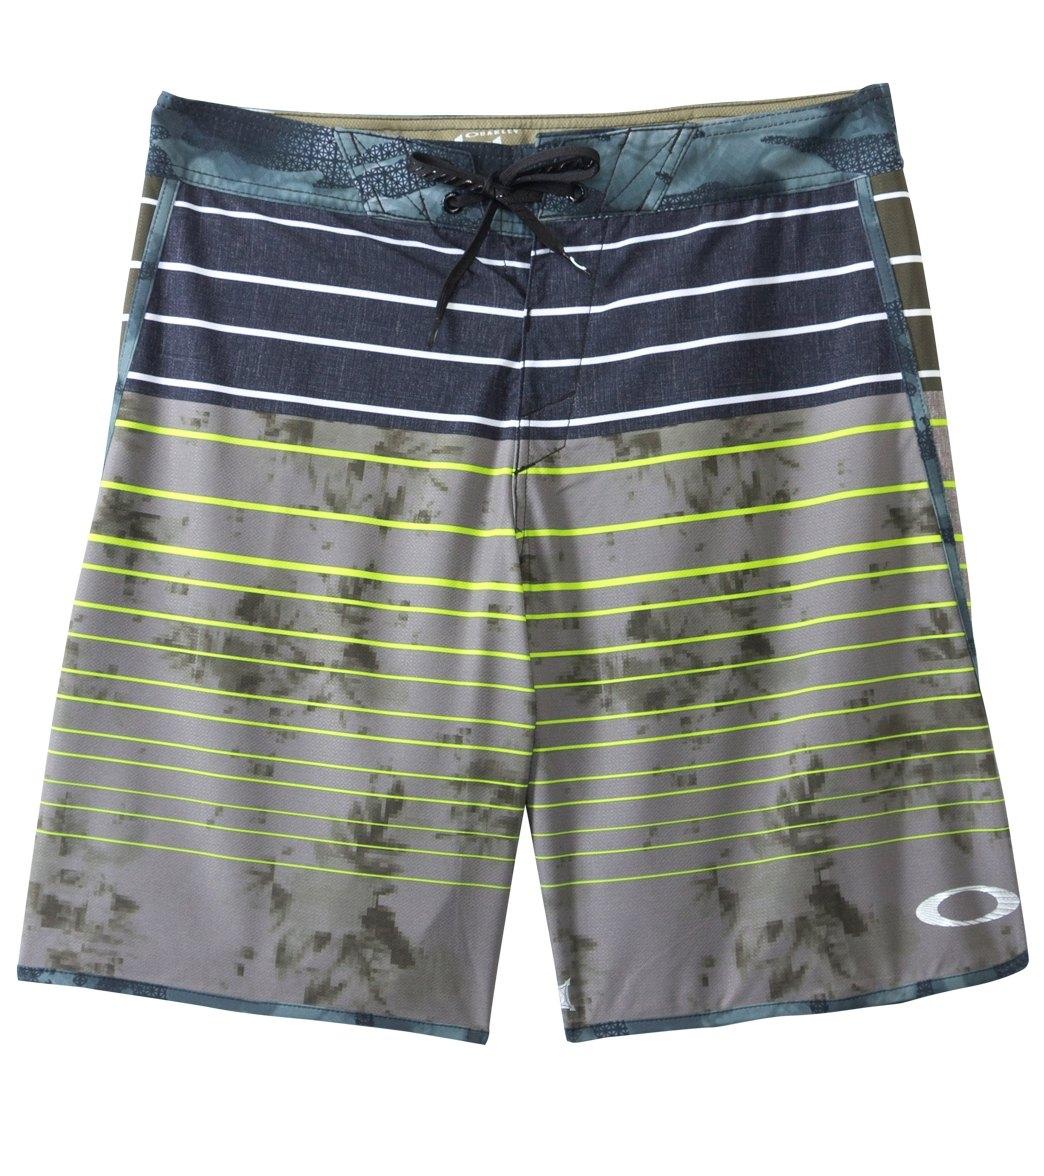 5069cdb112c395 Oakley Men's Blade Straight-Edge Boardshorts at SwimOutlet.com - Free  Shipping